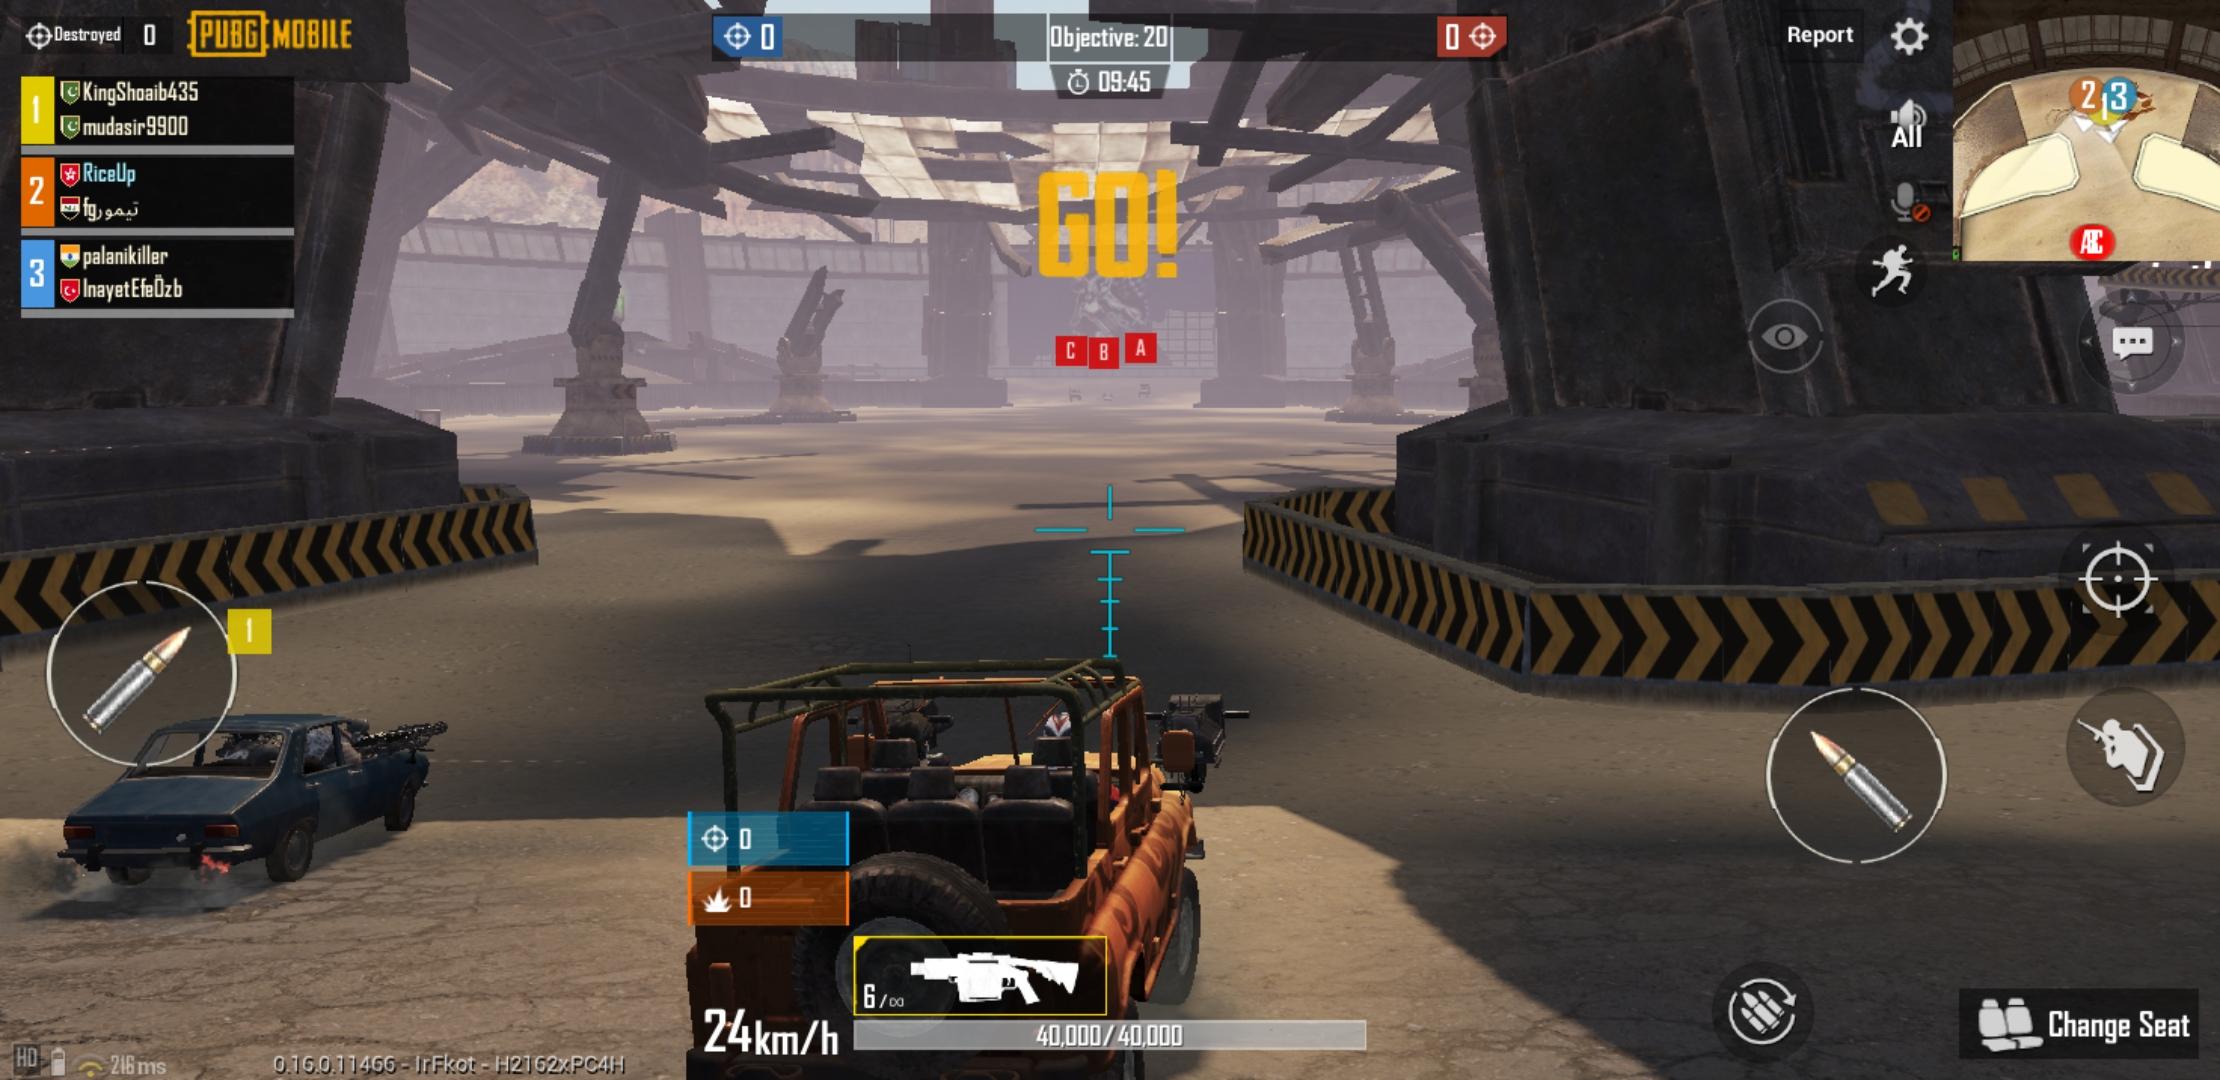 Three duo teams prepare for a TDM RageGear battle in PUBG Mobile.